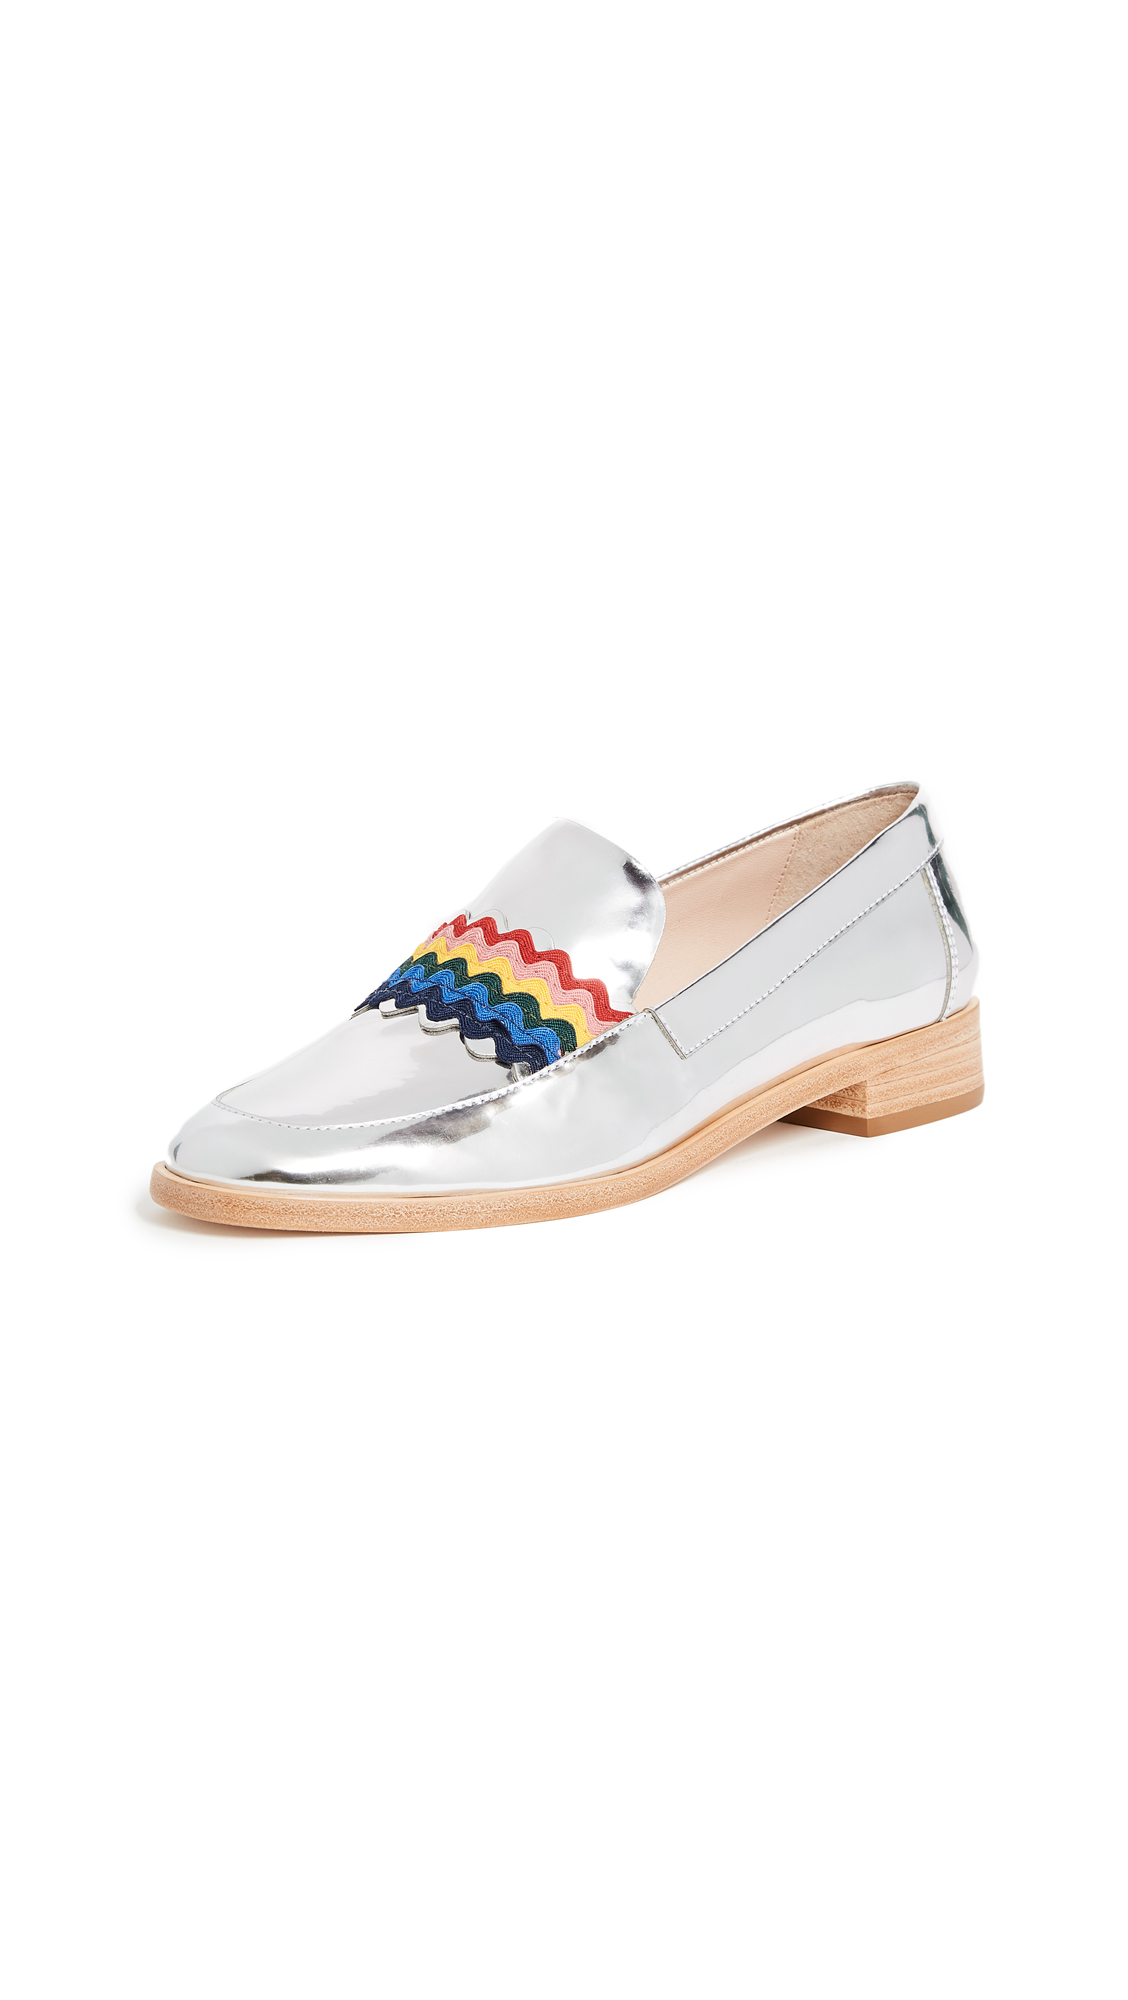 Photo of Loeffler Randall Greta Loafers - buy Loeffler Randall shoes